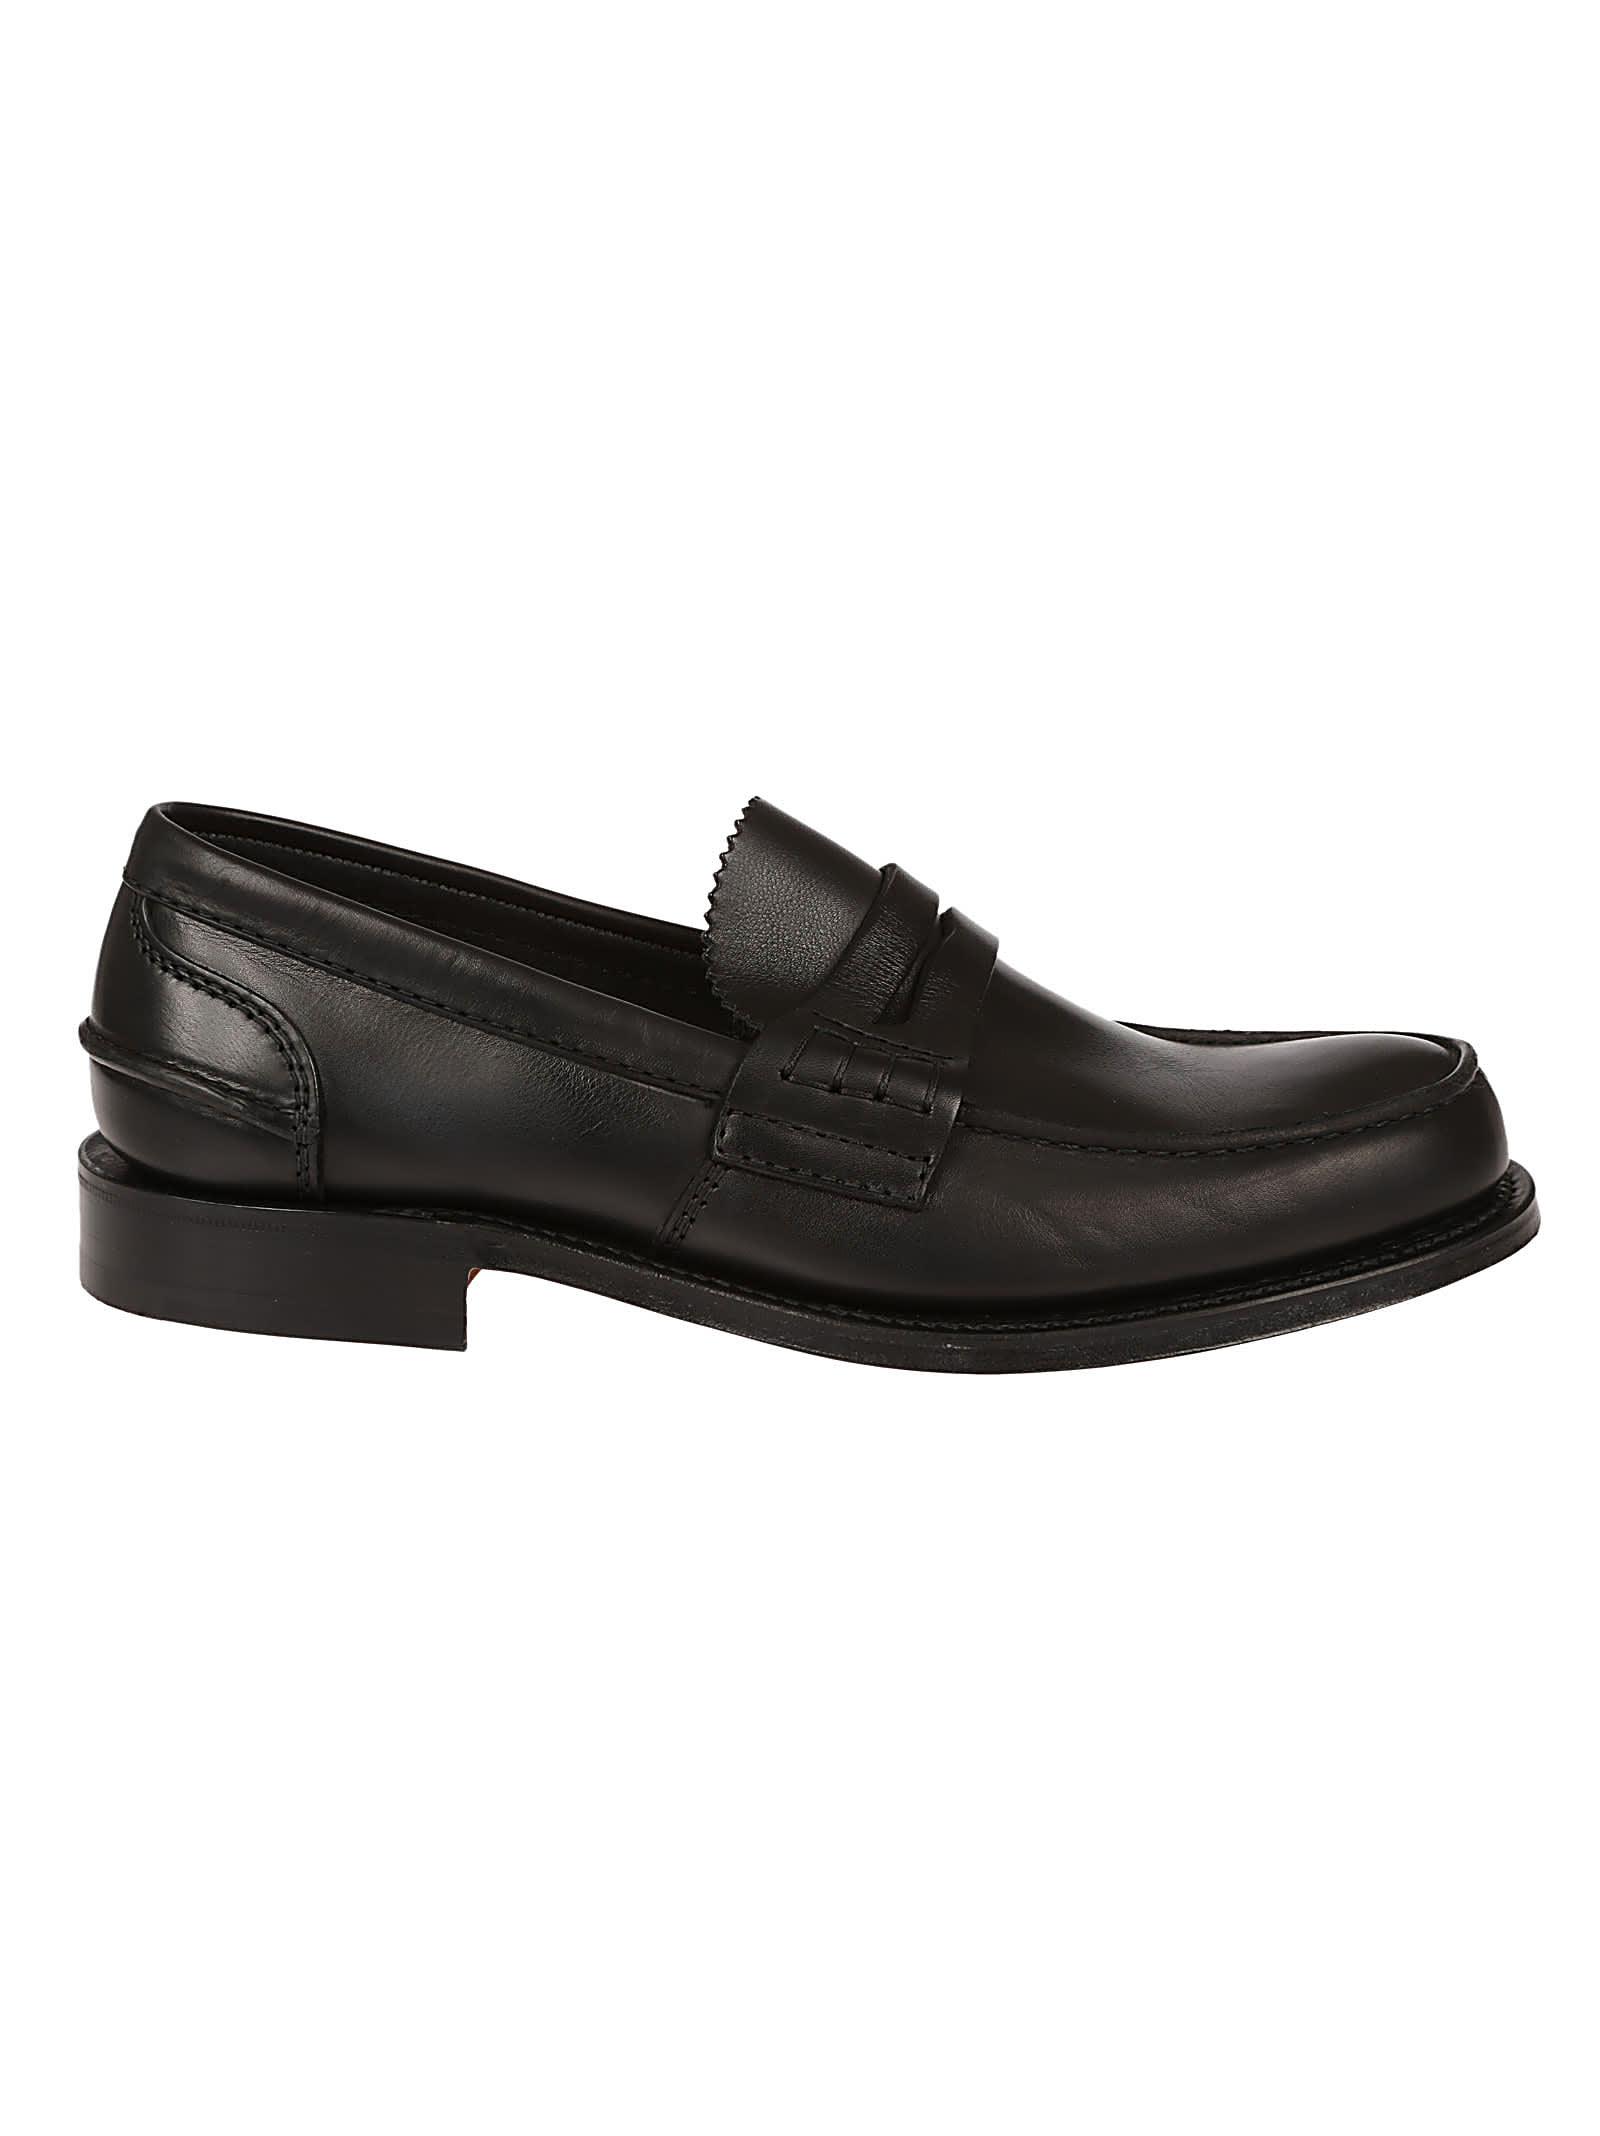 Churchs Pembrey Prestige Loafers